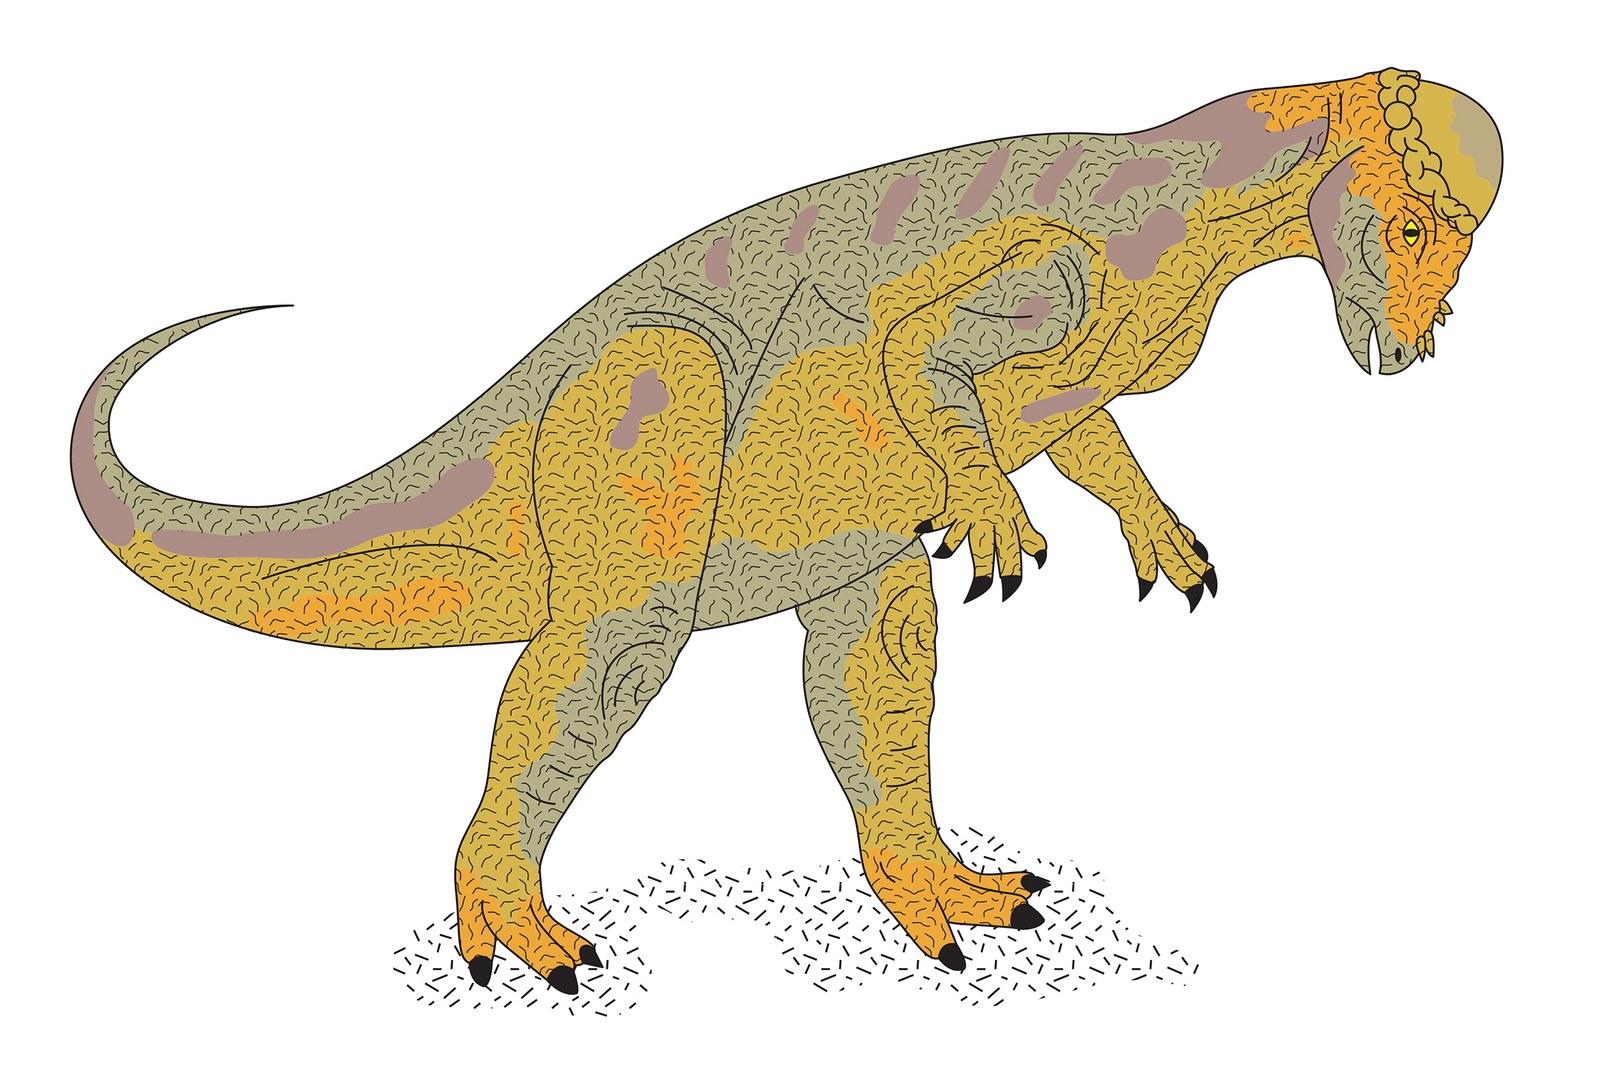 The definitive jurassic park. Dinosaurs clipart scary dinosaur